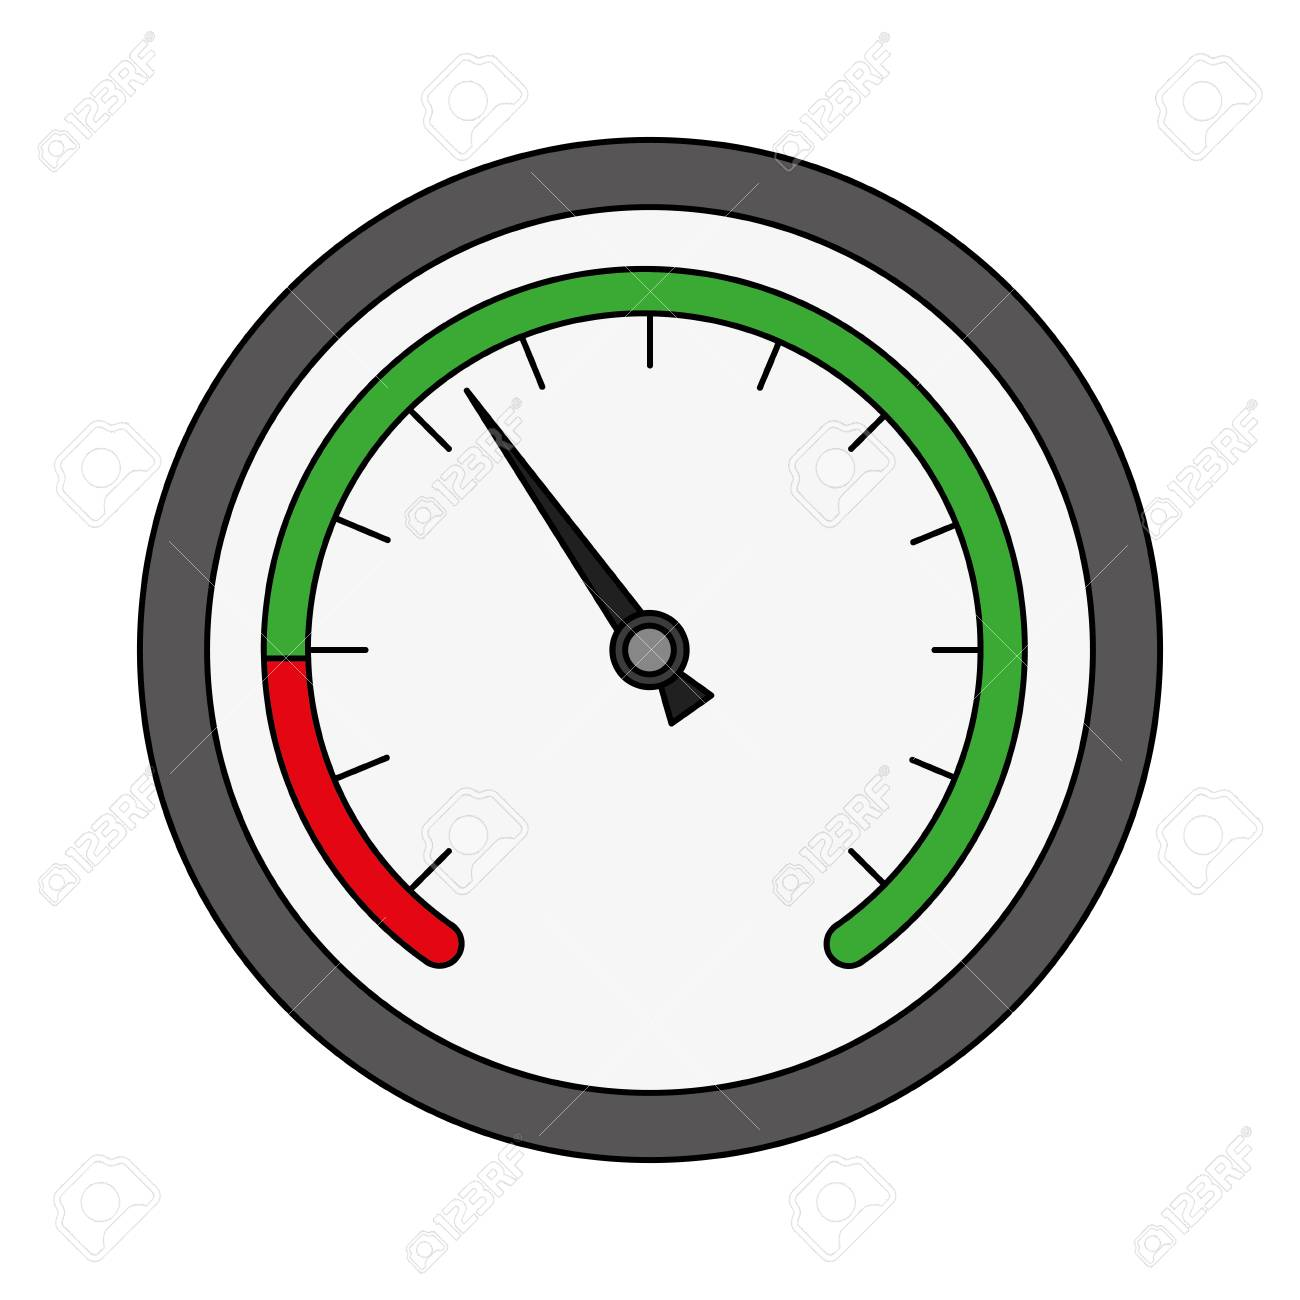 speed gauge isolated icon vector illustration design - 106217647